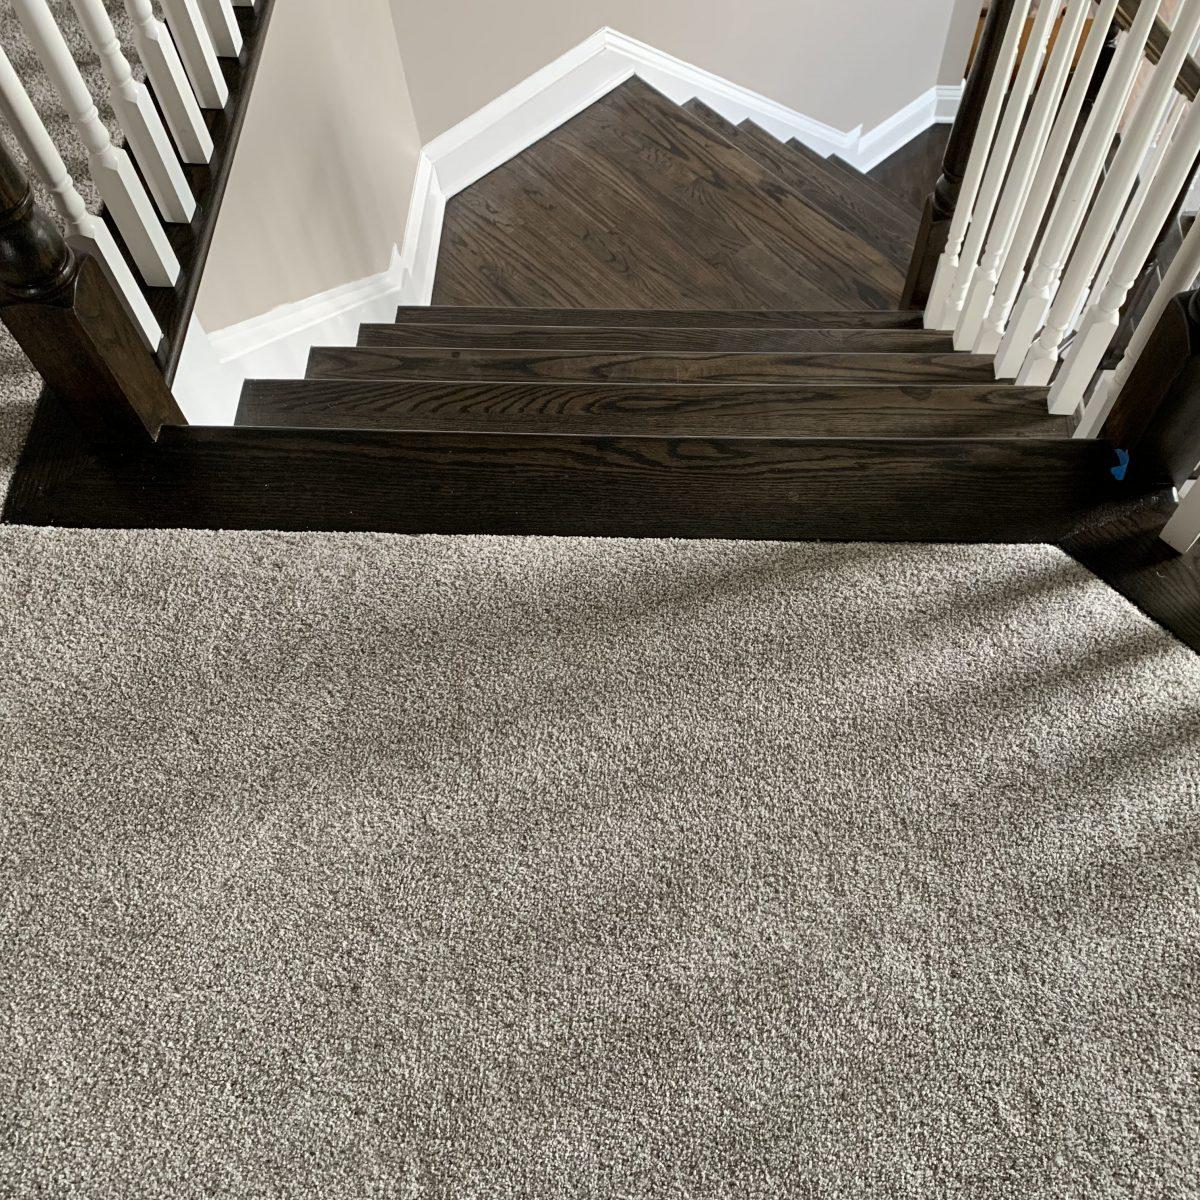 floors direct llc shop at home carpet nj